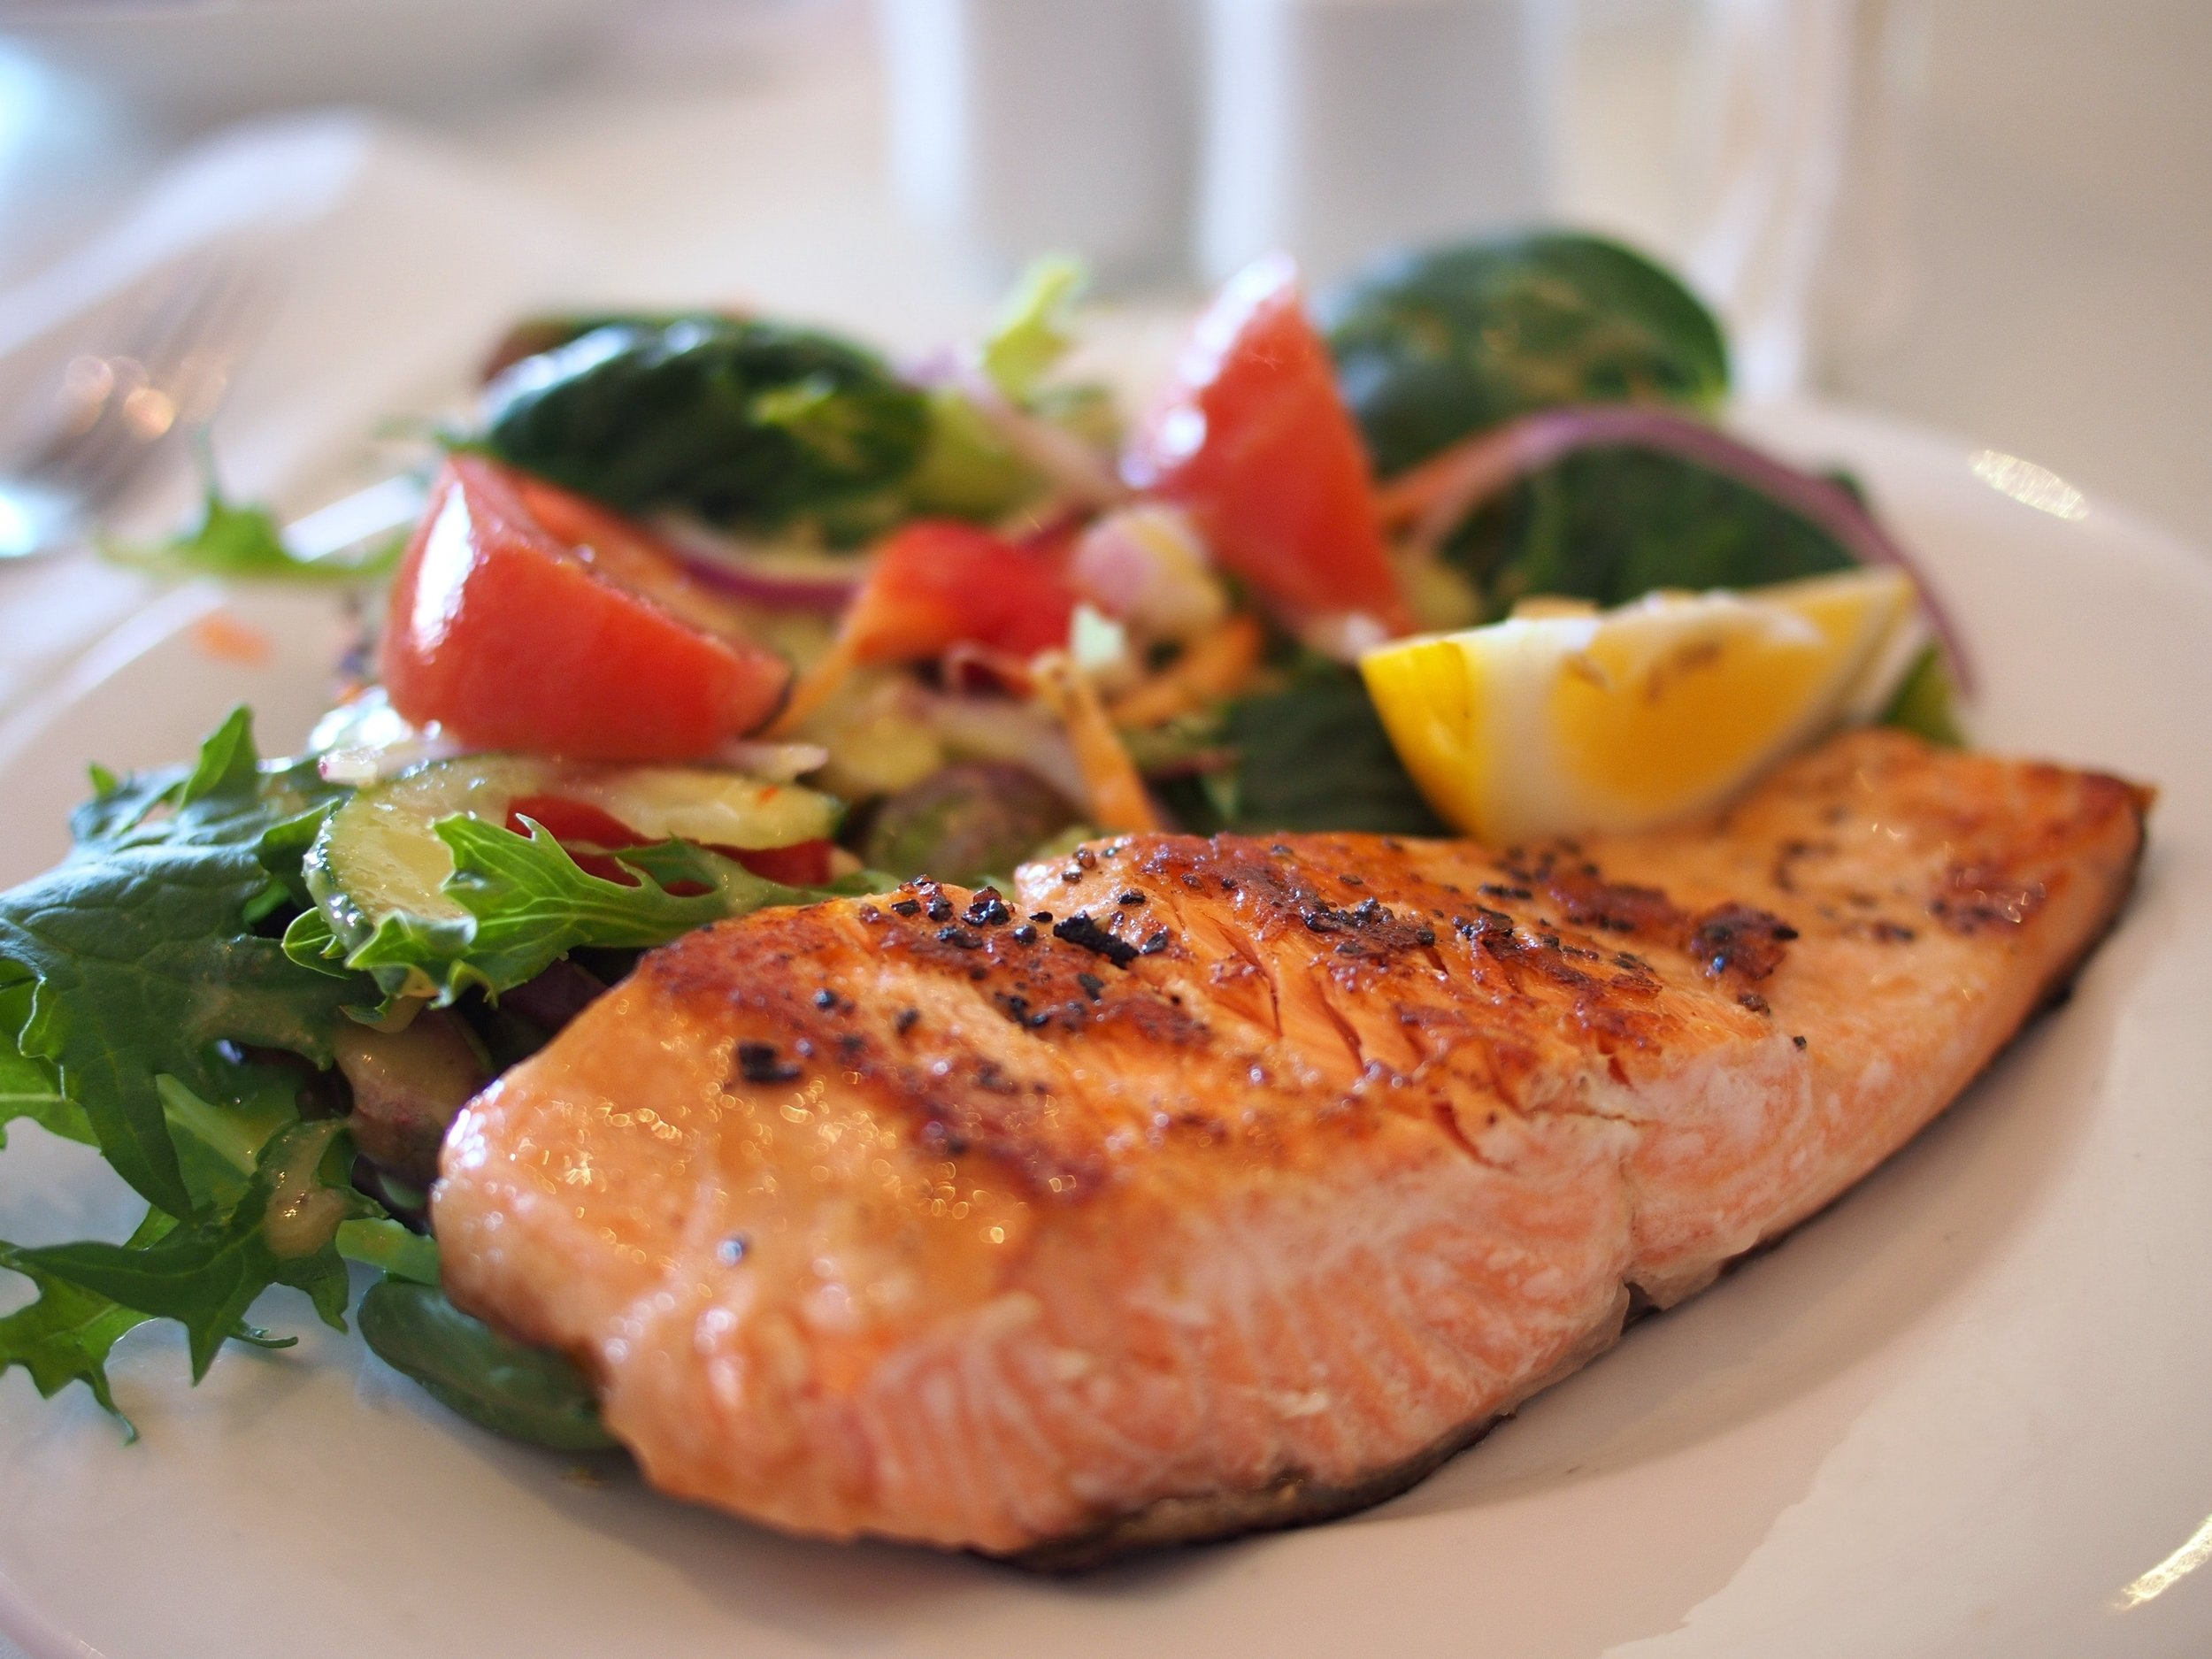 WS. #10 close-up-dinner-fish-46239.jpg